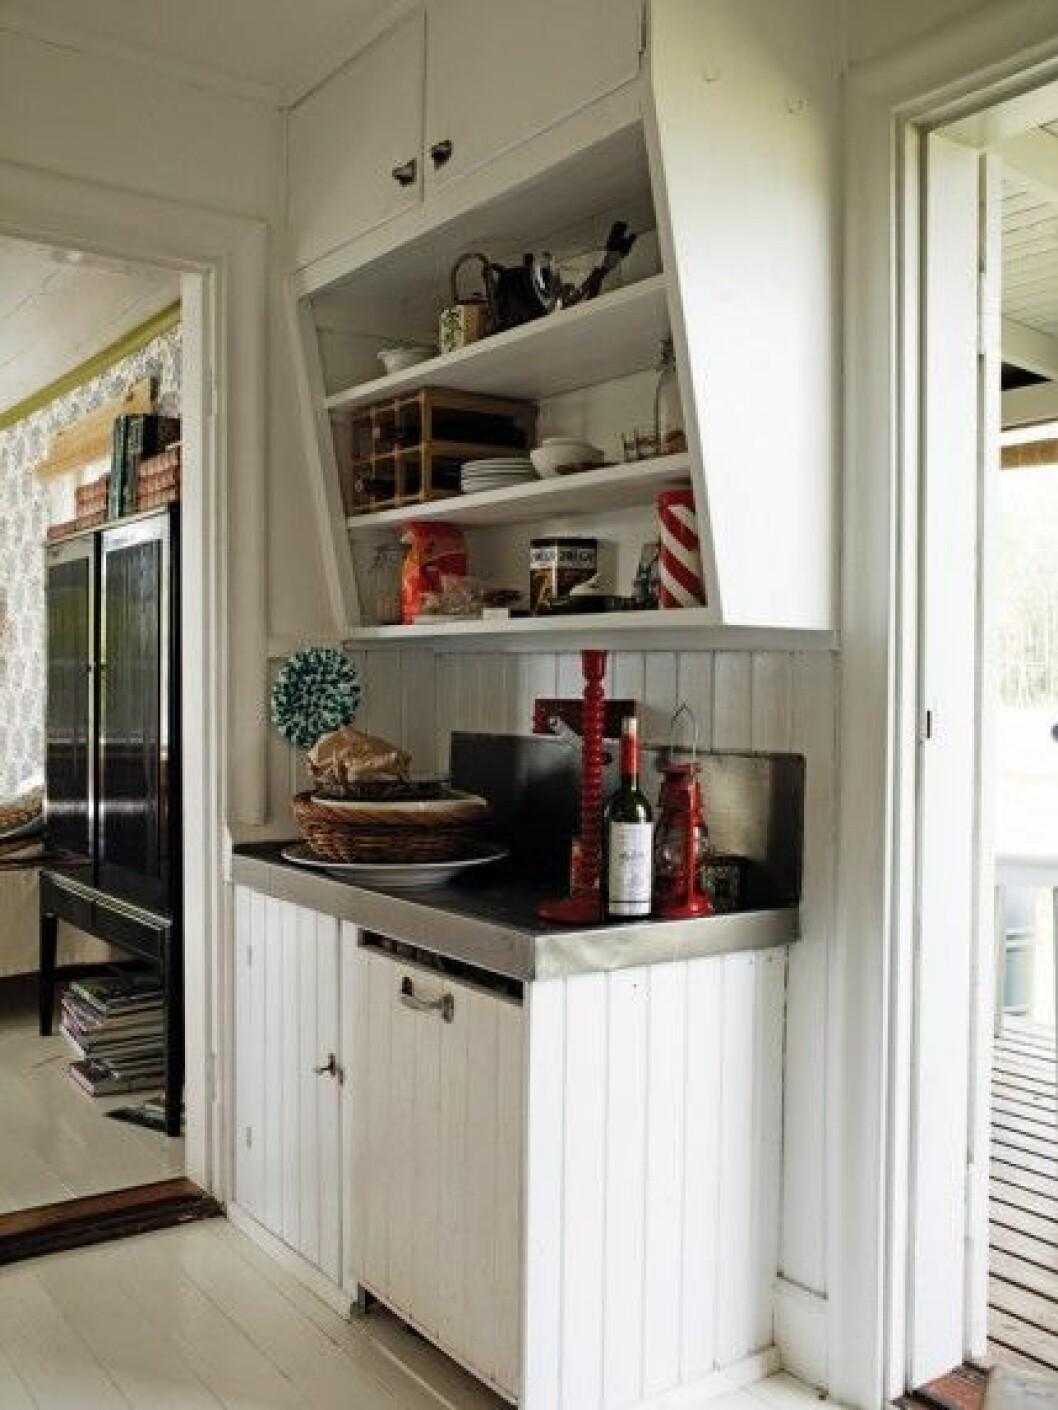 Foto-Pia-Ulin-Cilla-Ramnek-kok-skap-kitchen-cabinets